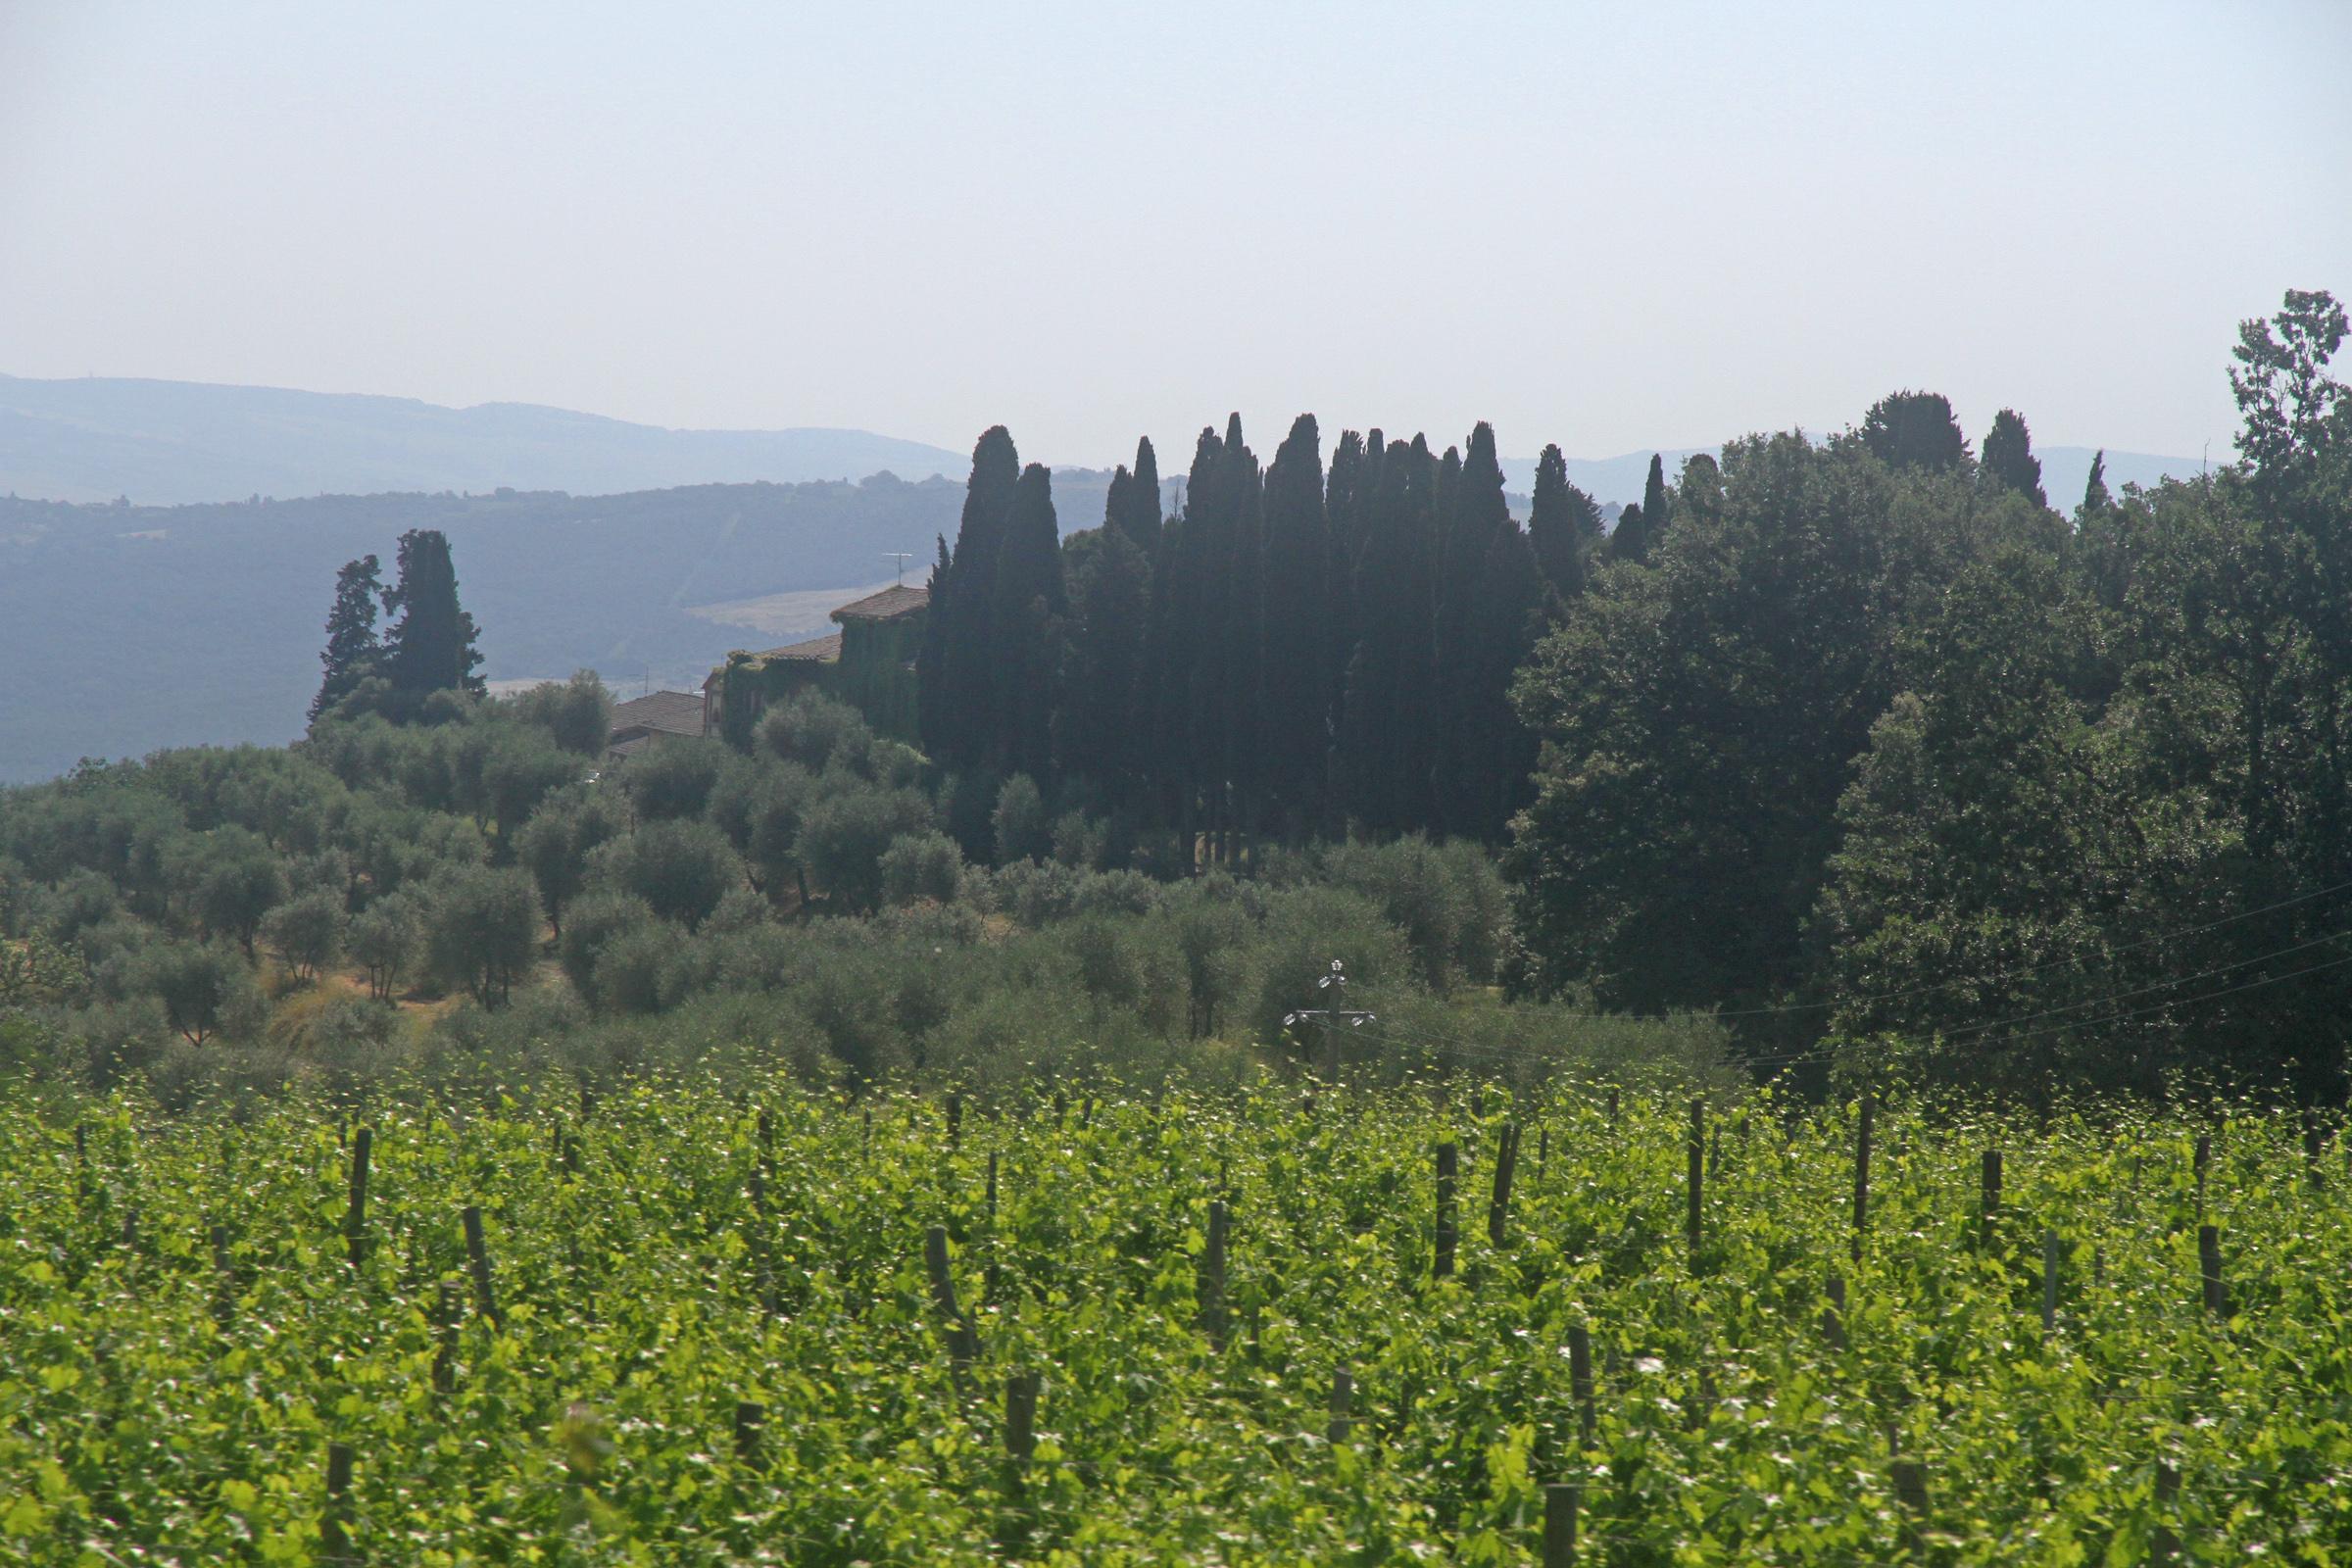 Vineyard, Tuscany